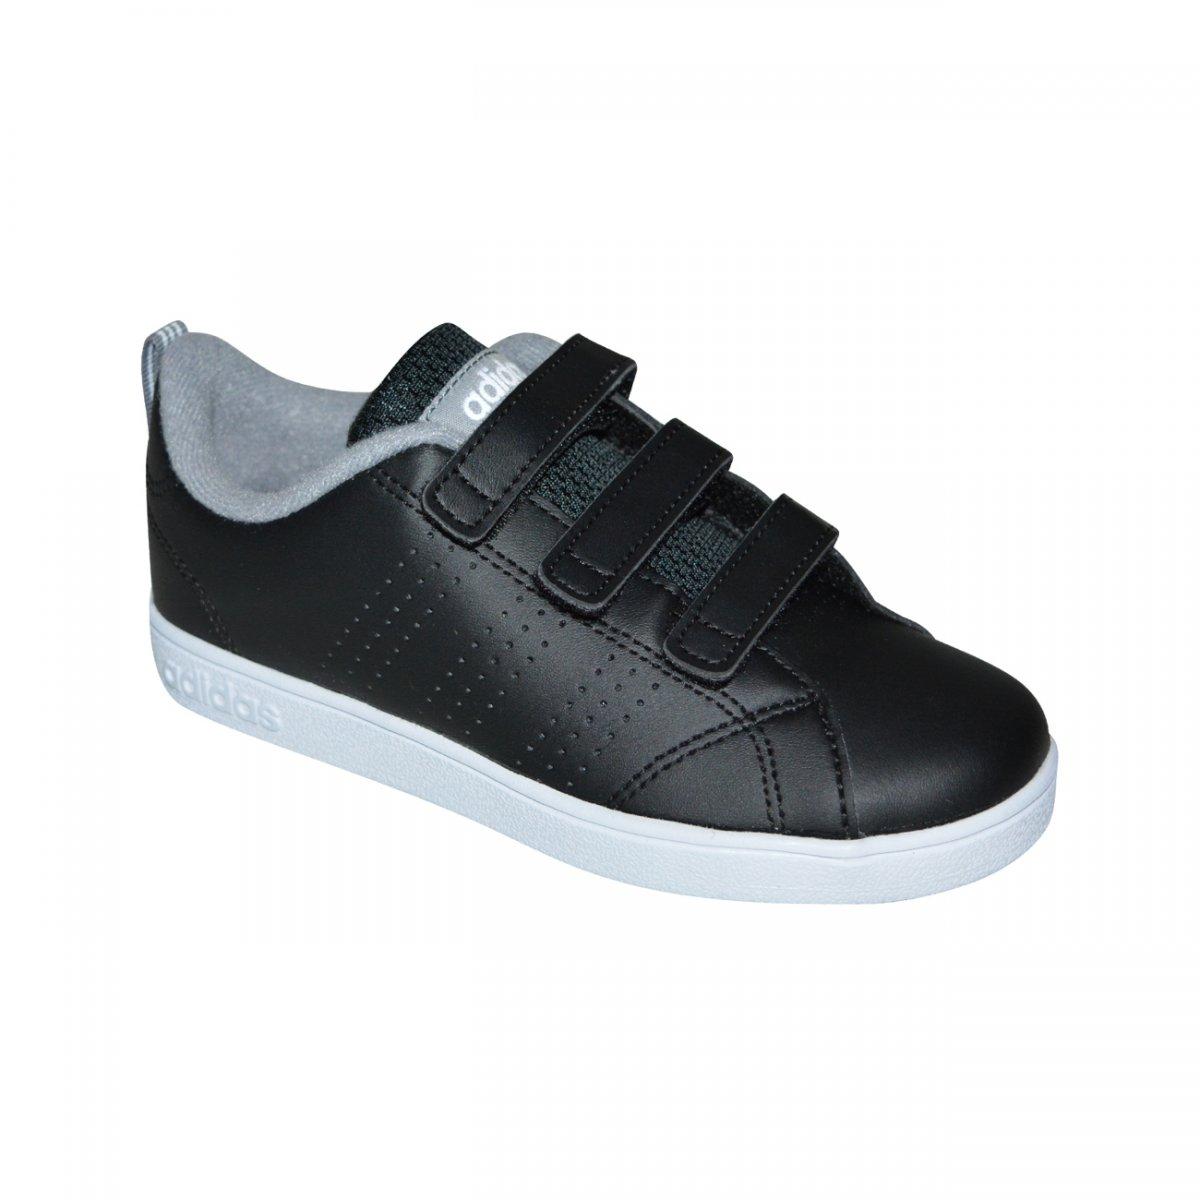 bf1d65207 Tenis Adidas VS Advantage Clean CMF C Infantil DB1822 - Preto cinza branco  - Chuteira Nike